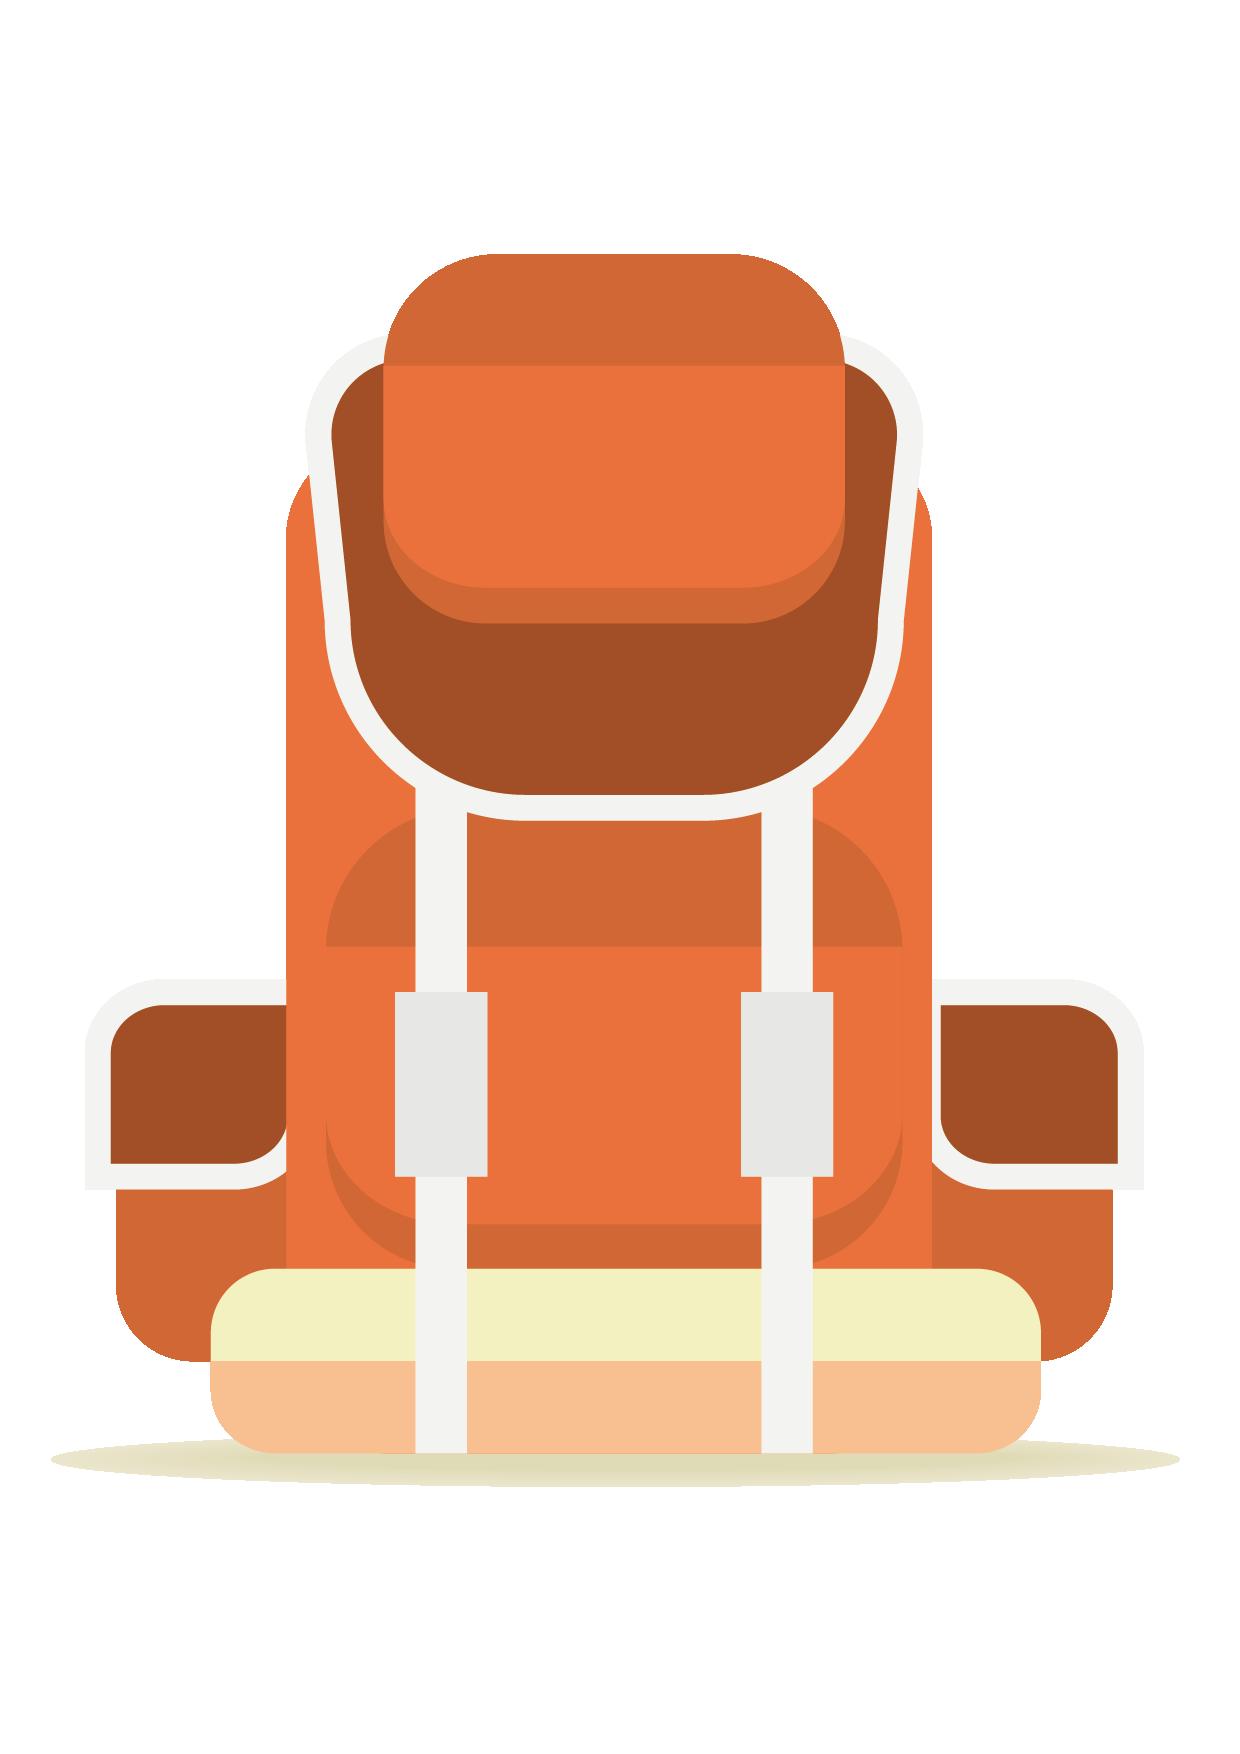 Furniture clipart adobe illustrator. Chair cartoon red bag